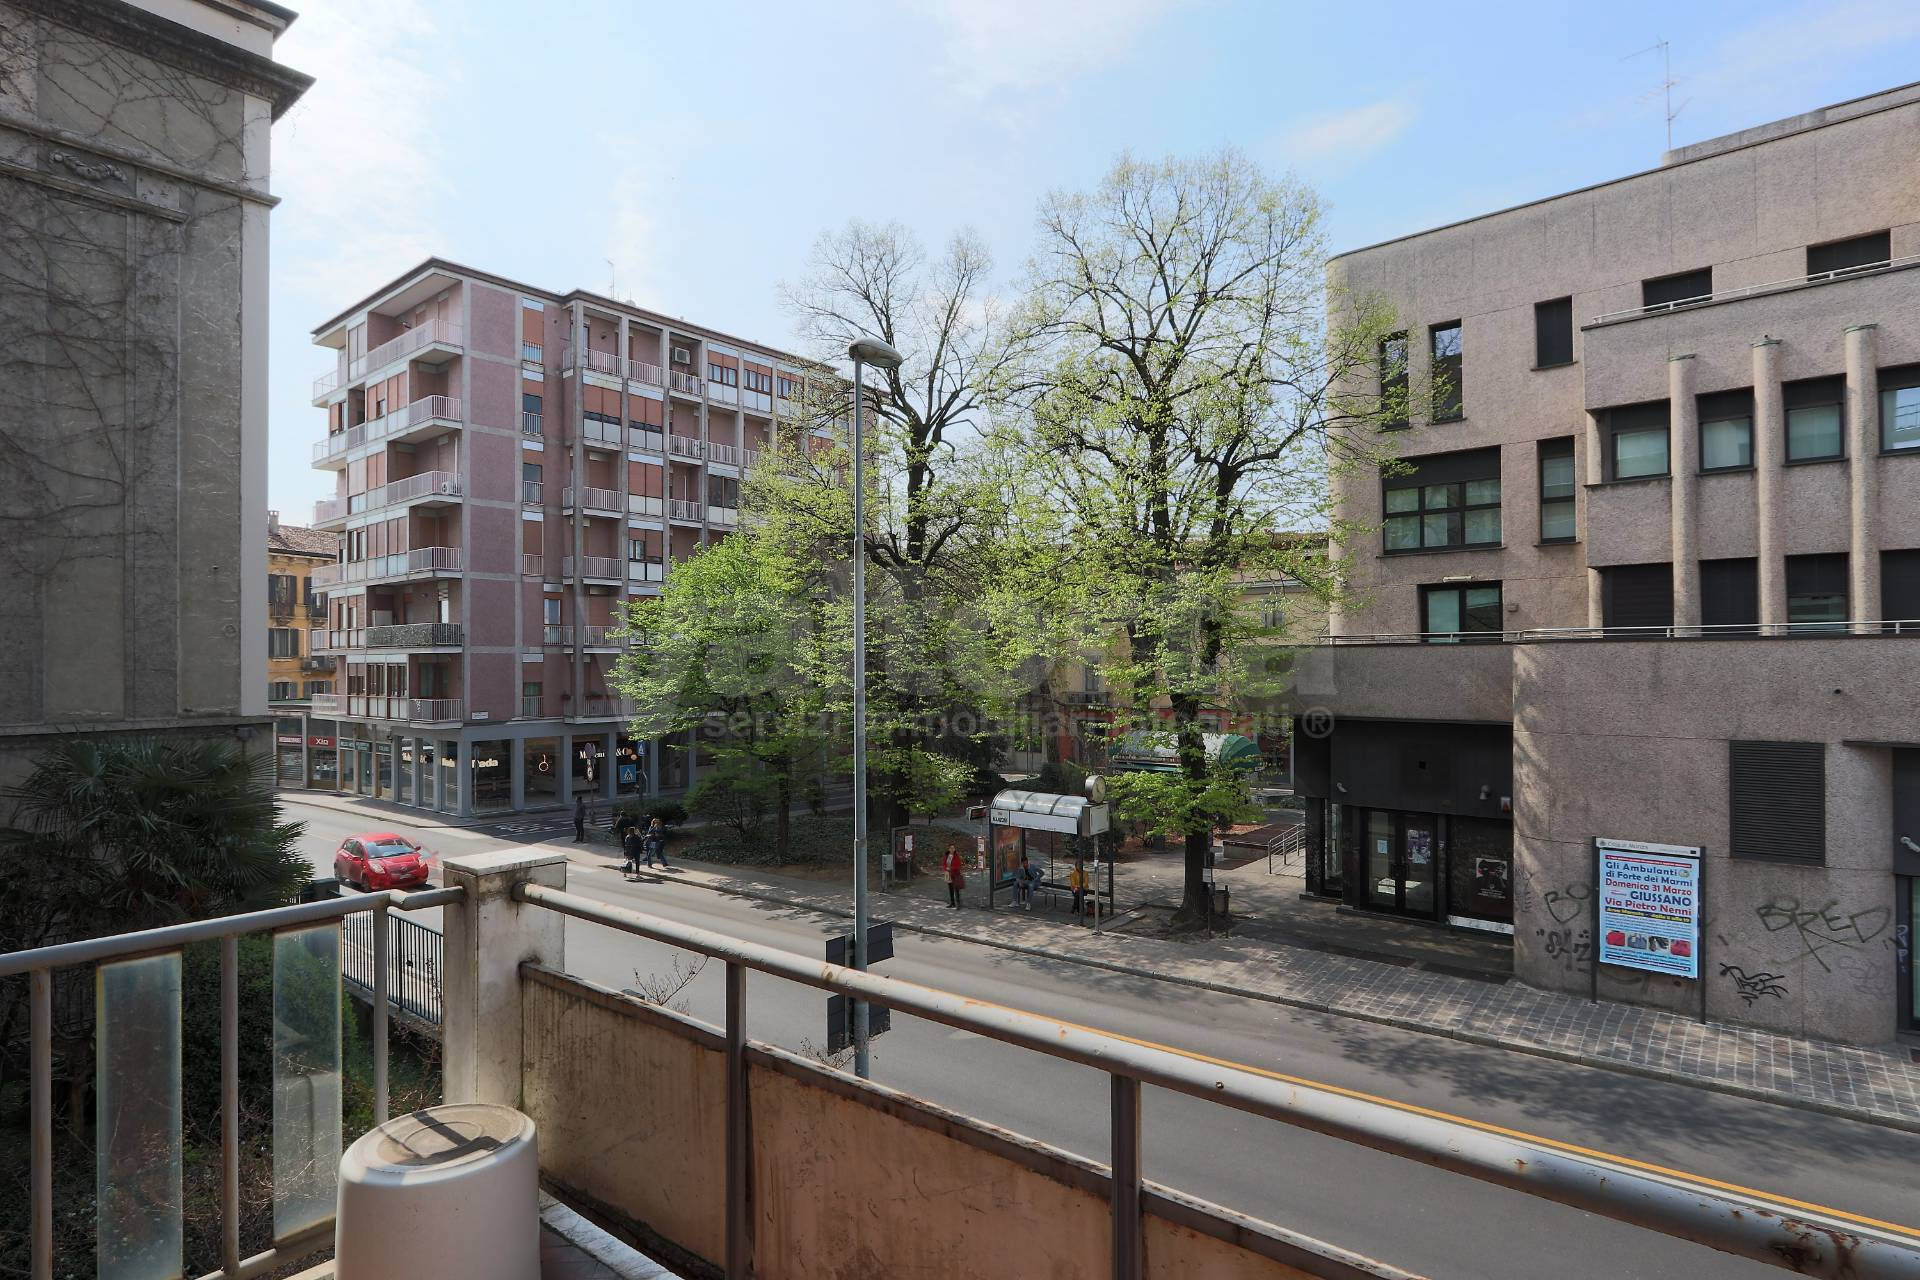 Via Pietro Nenni Giussano vendita appartamento via manzoni 35, monza — valtorta